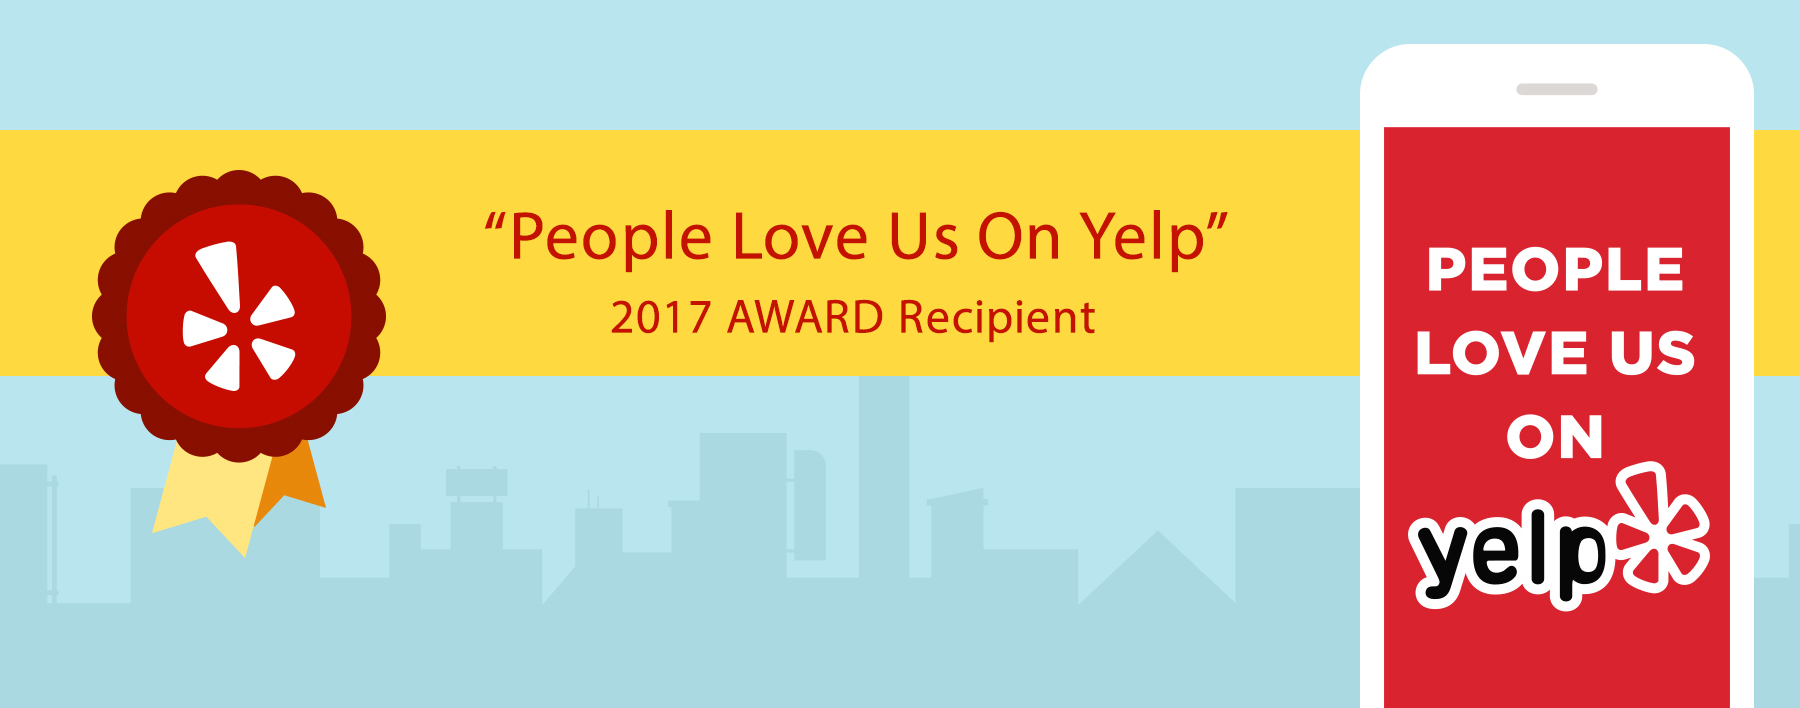 yelp-people love us award